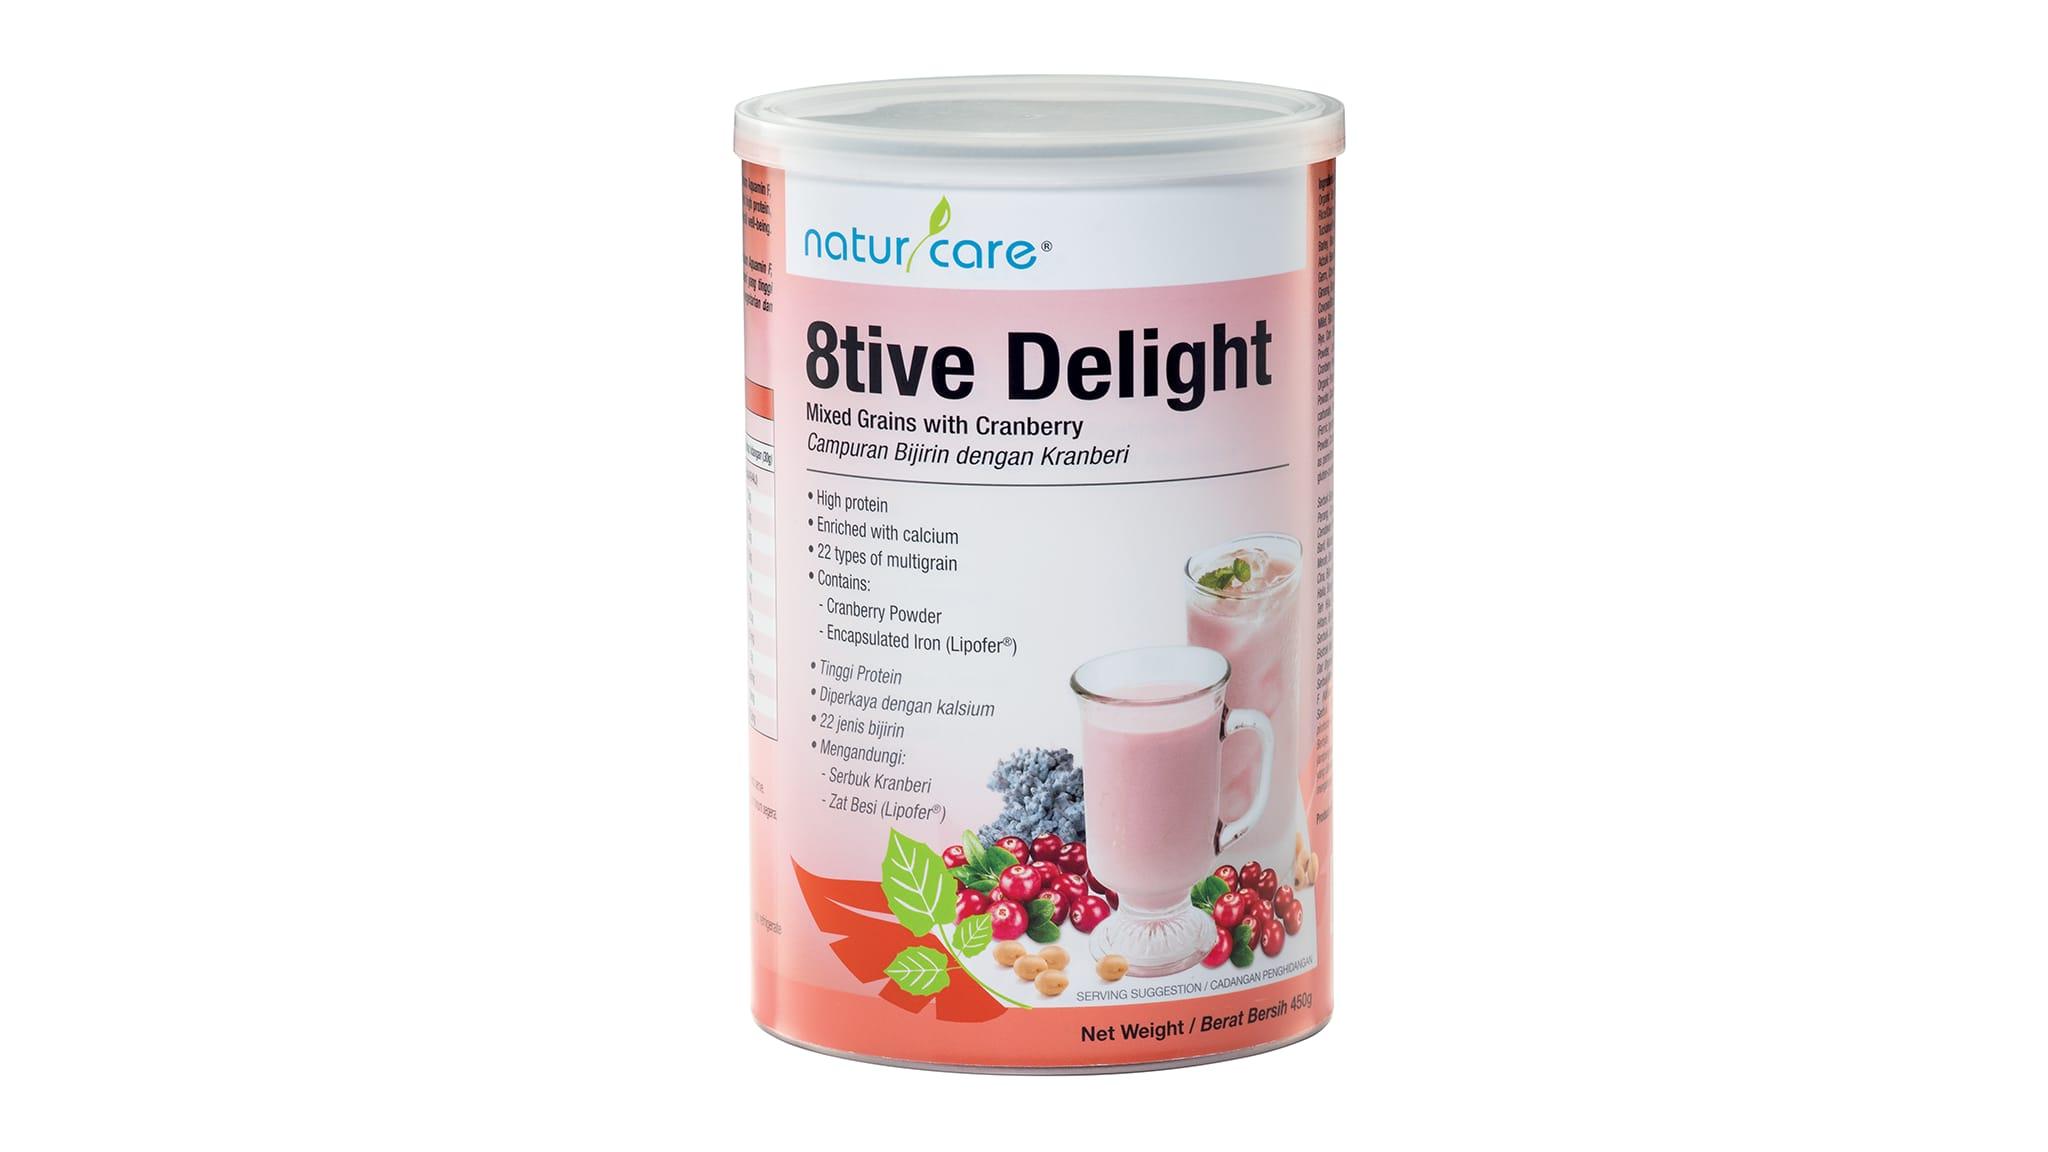 NaturCare® 8tive Delight 450g